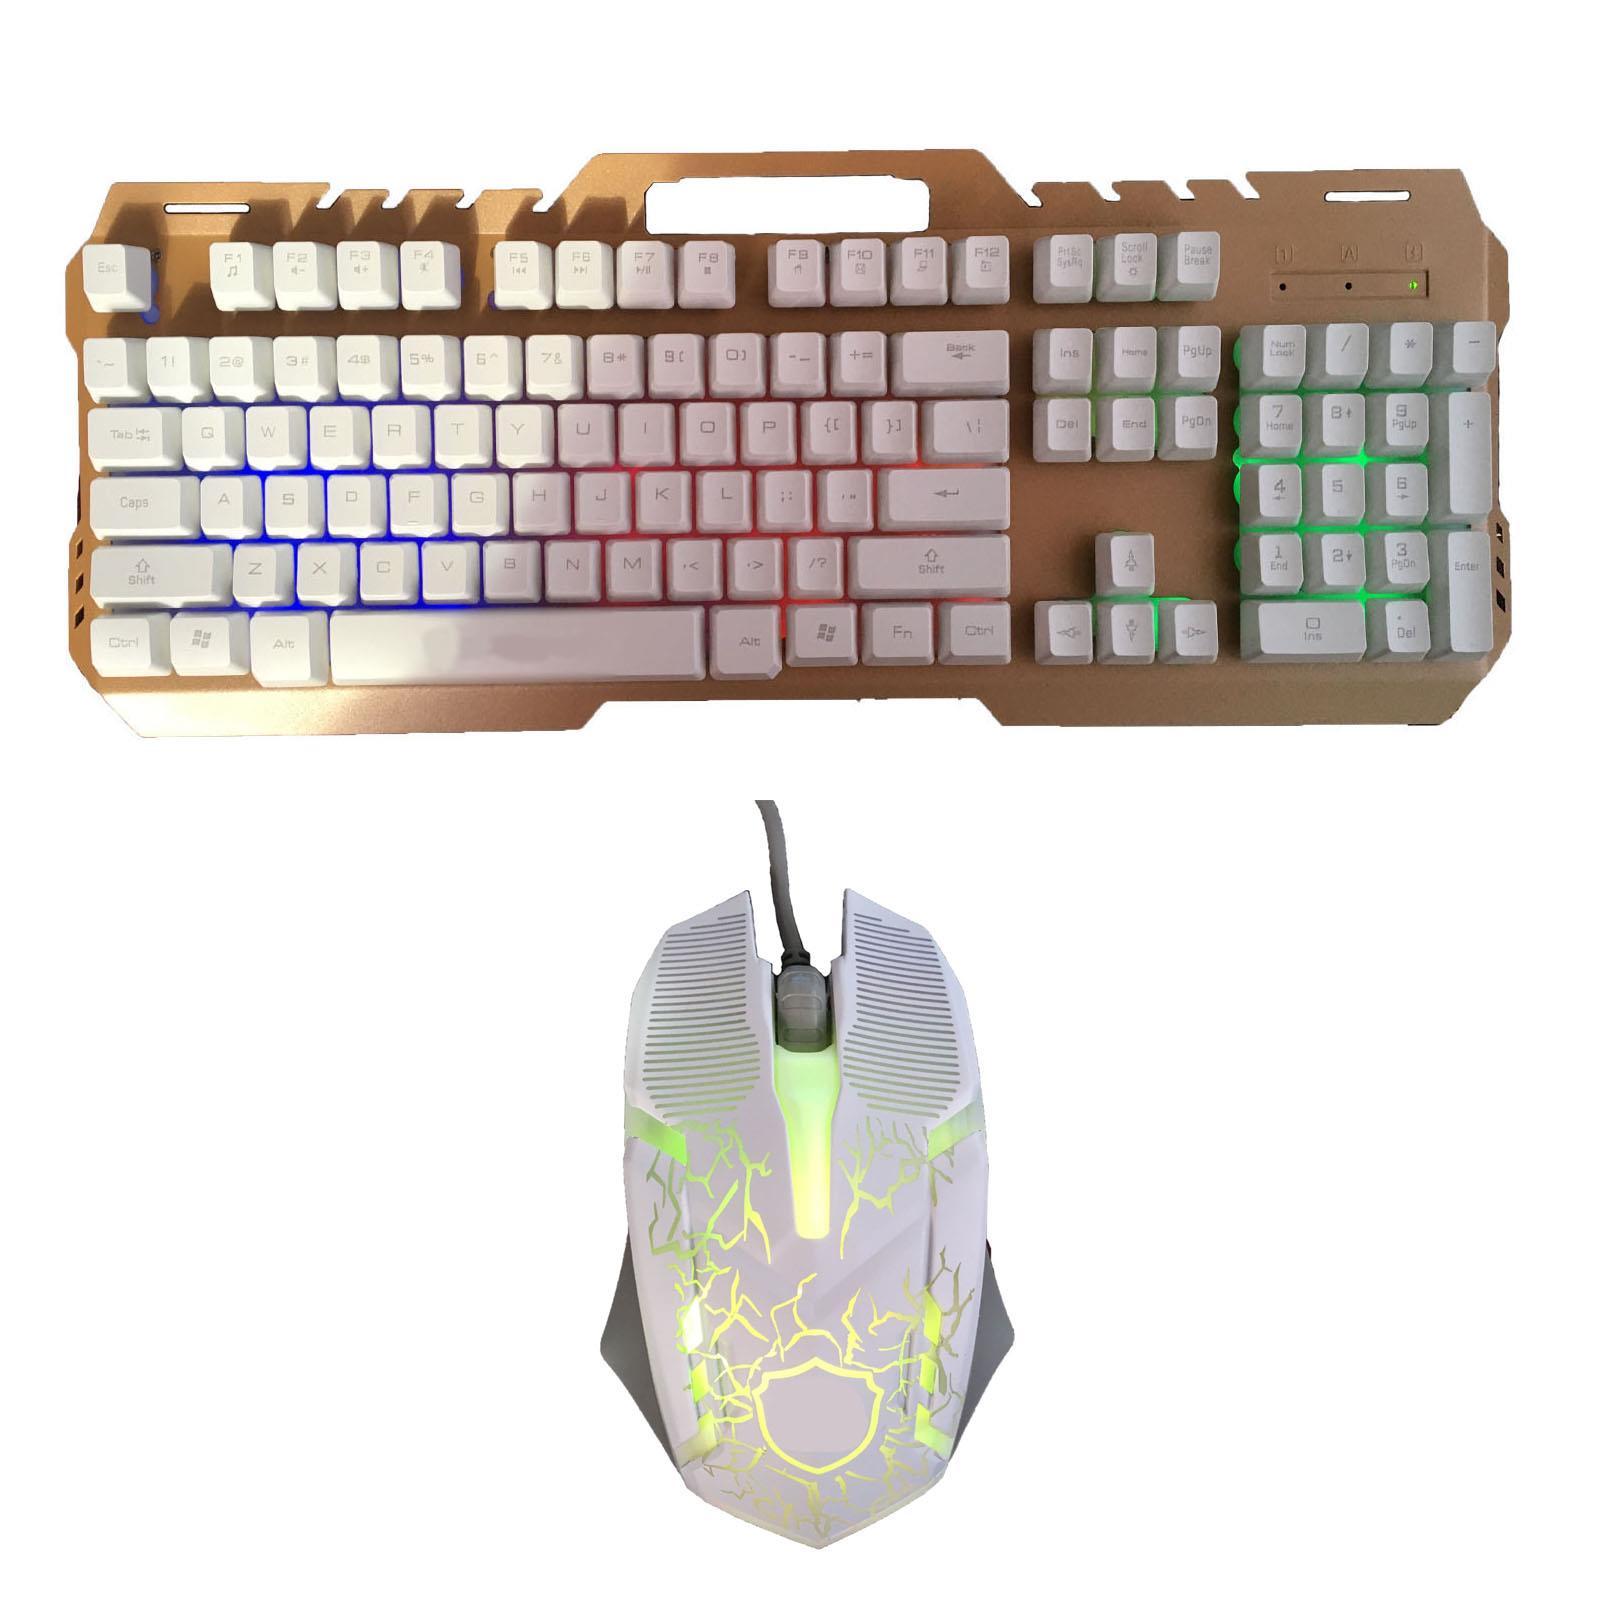 Gaming-Keyboard-Mouse-Backlit-Rainbow-LED-USB-Set-for-PC-Laptop-PS4-Xbox-One thumbnail 48